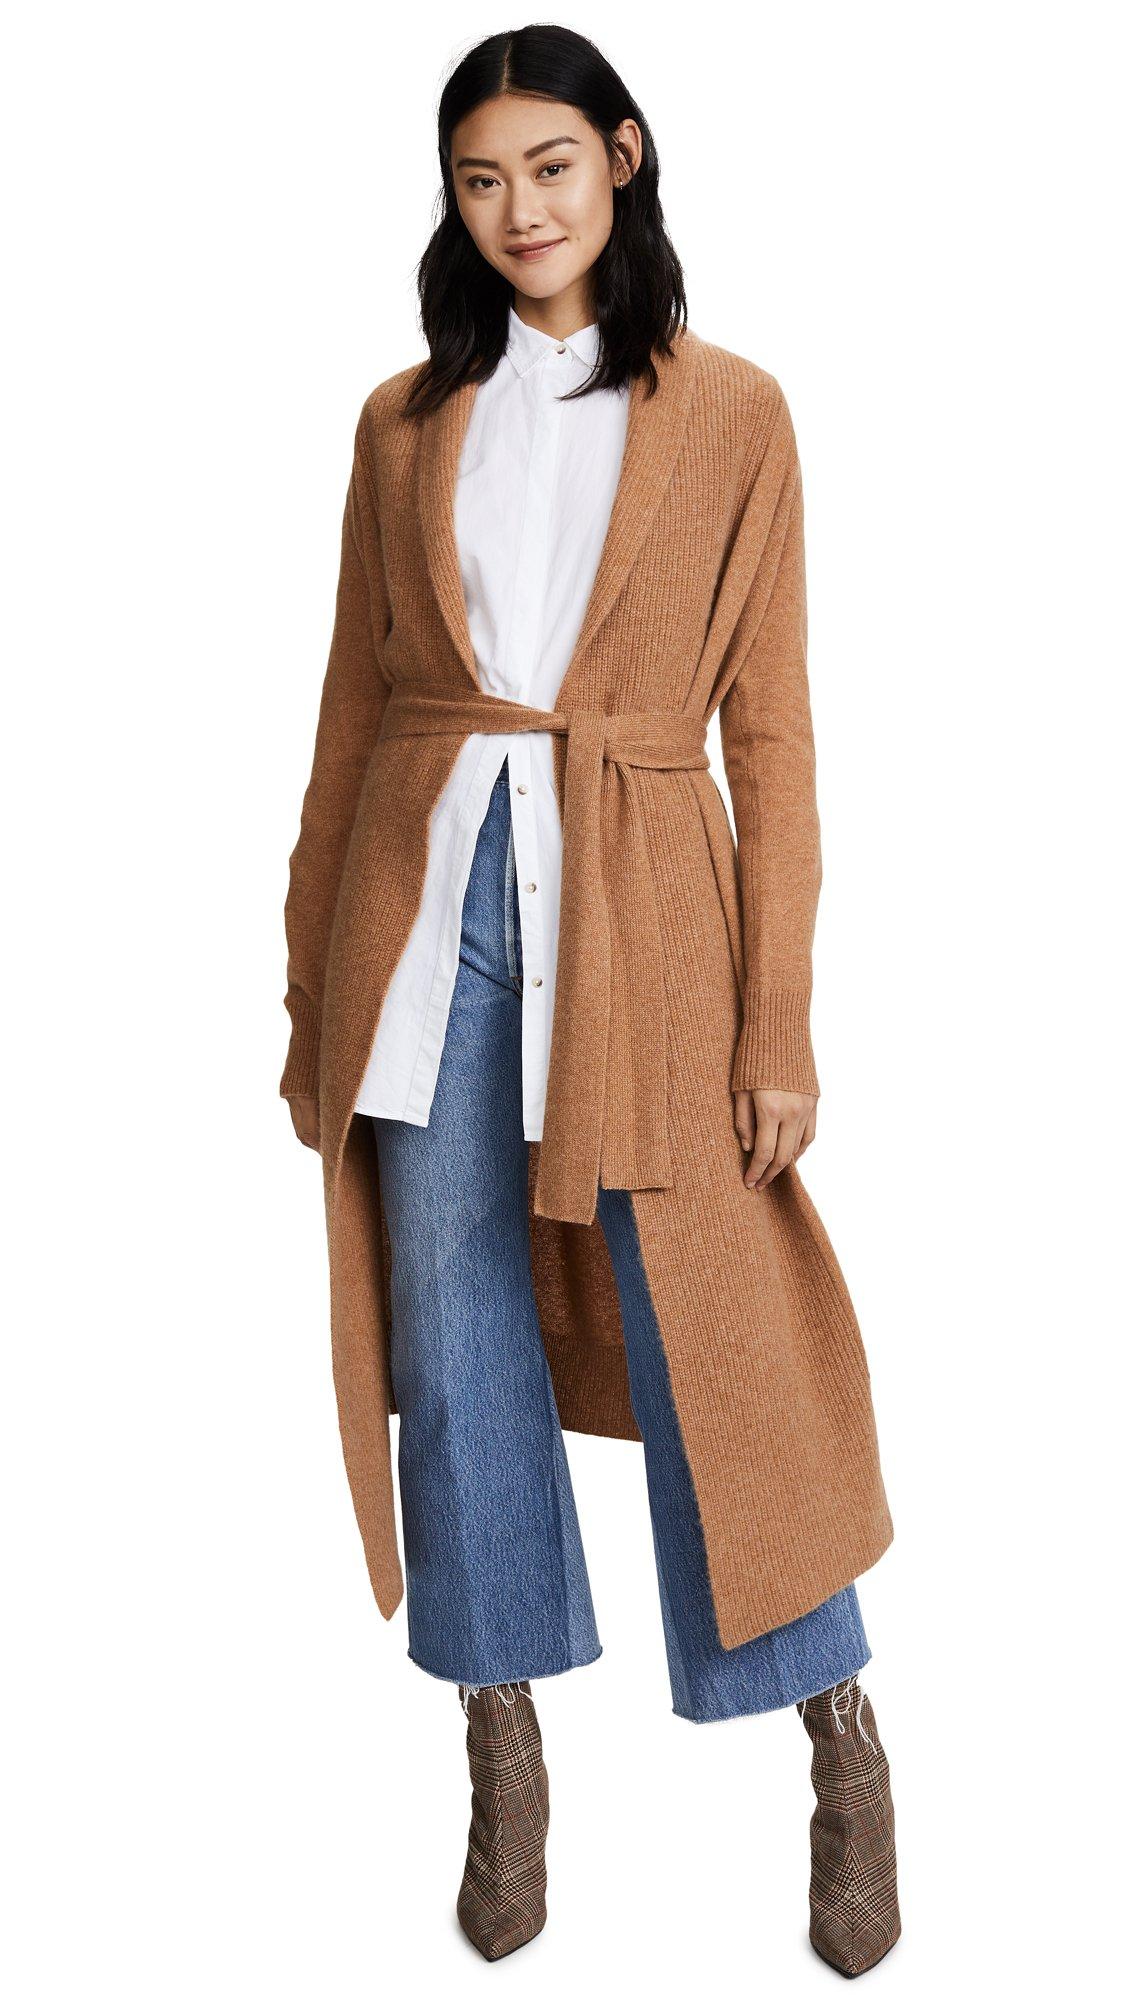 360 SWEATER Women's Shayanne Cashmere Cardigan, Acorn, Medium